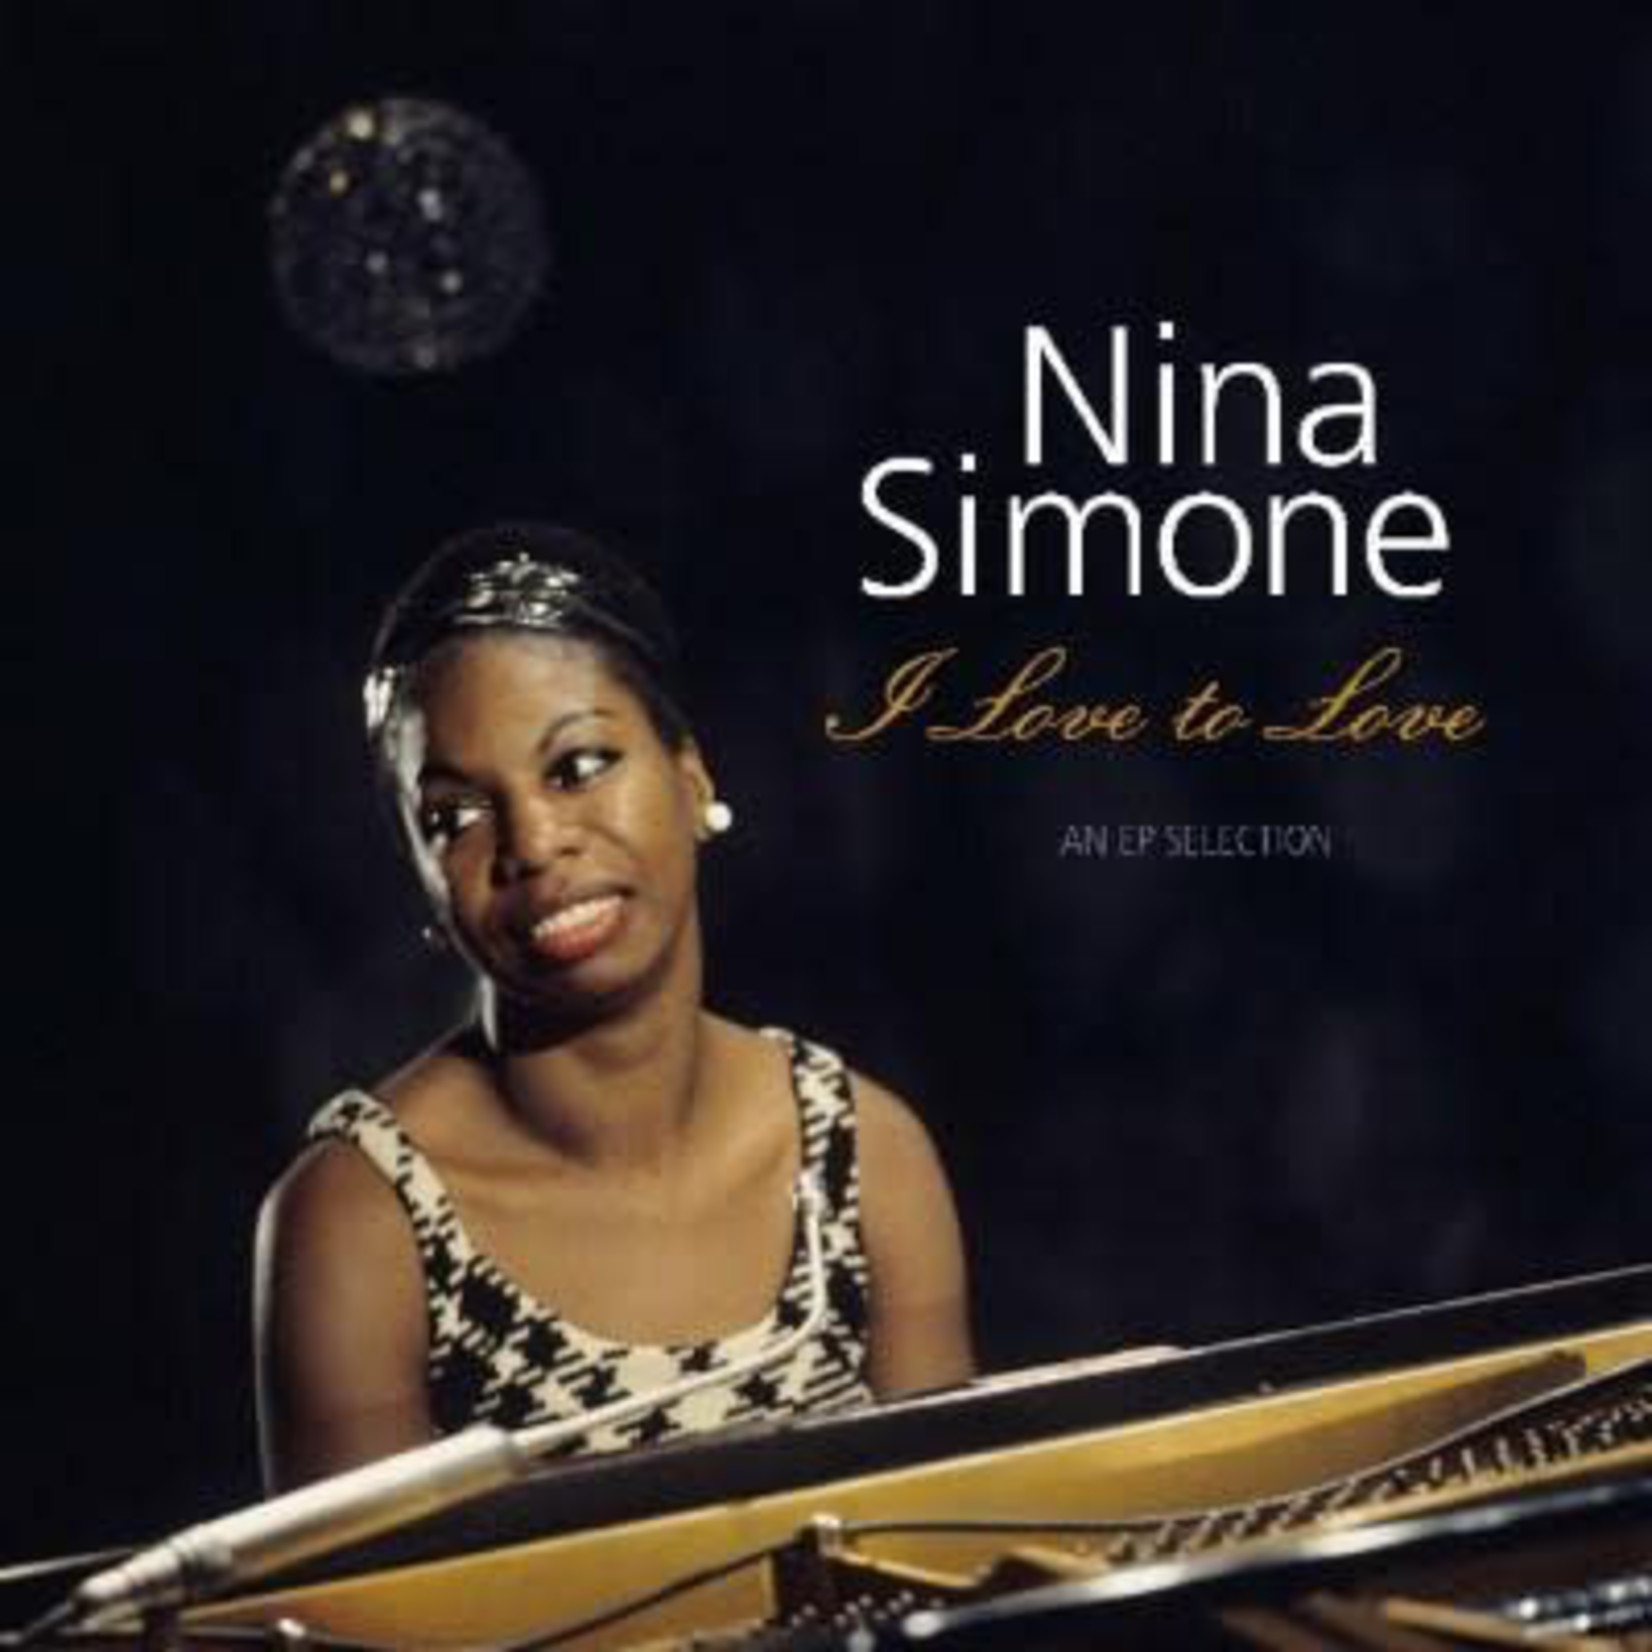 Vinyl Nina Simone - I lLove to Love